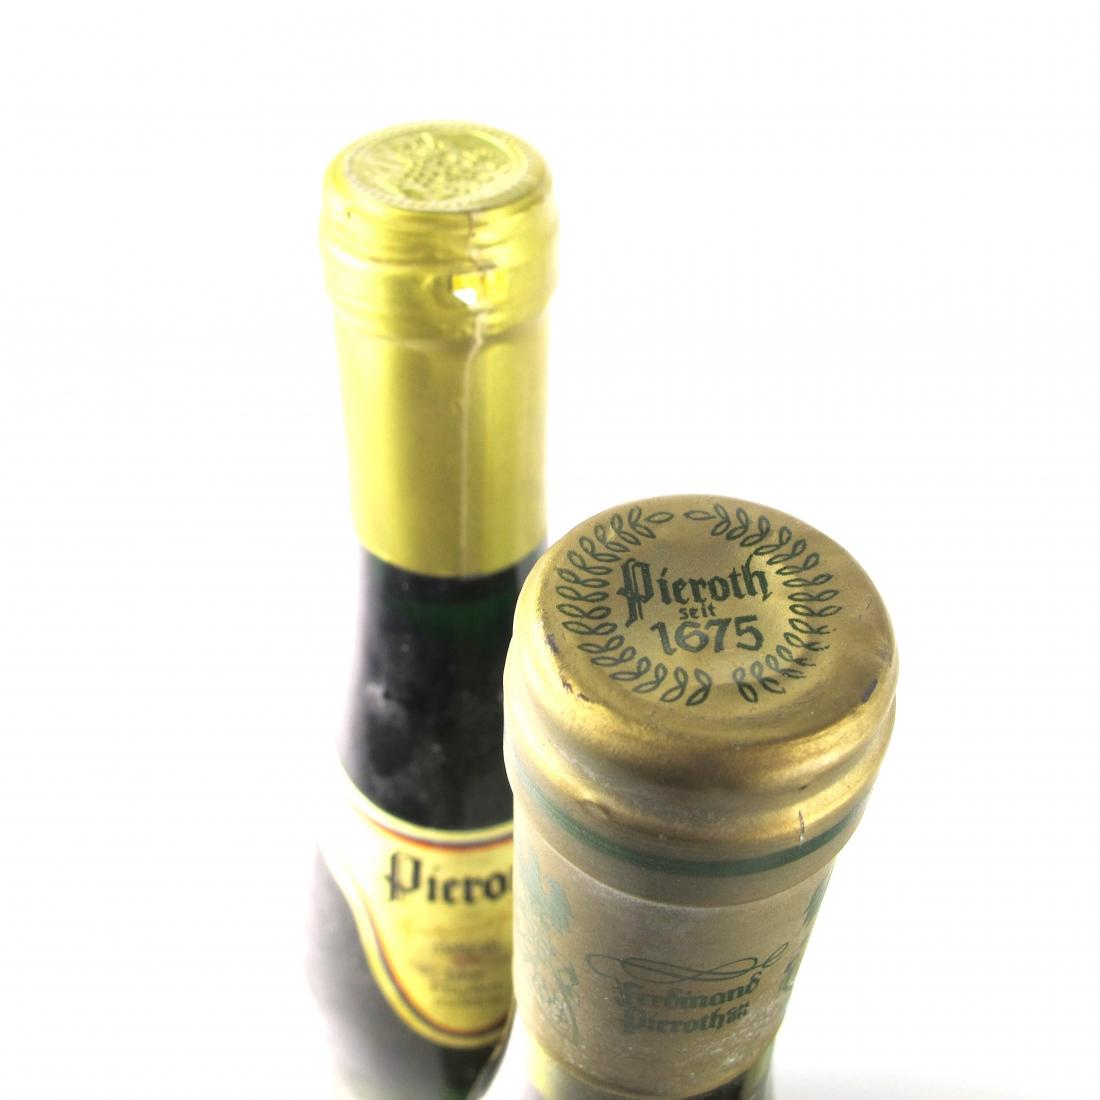 Pieroth German Wines 5x75cl